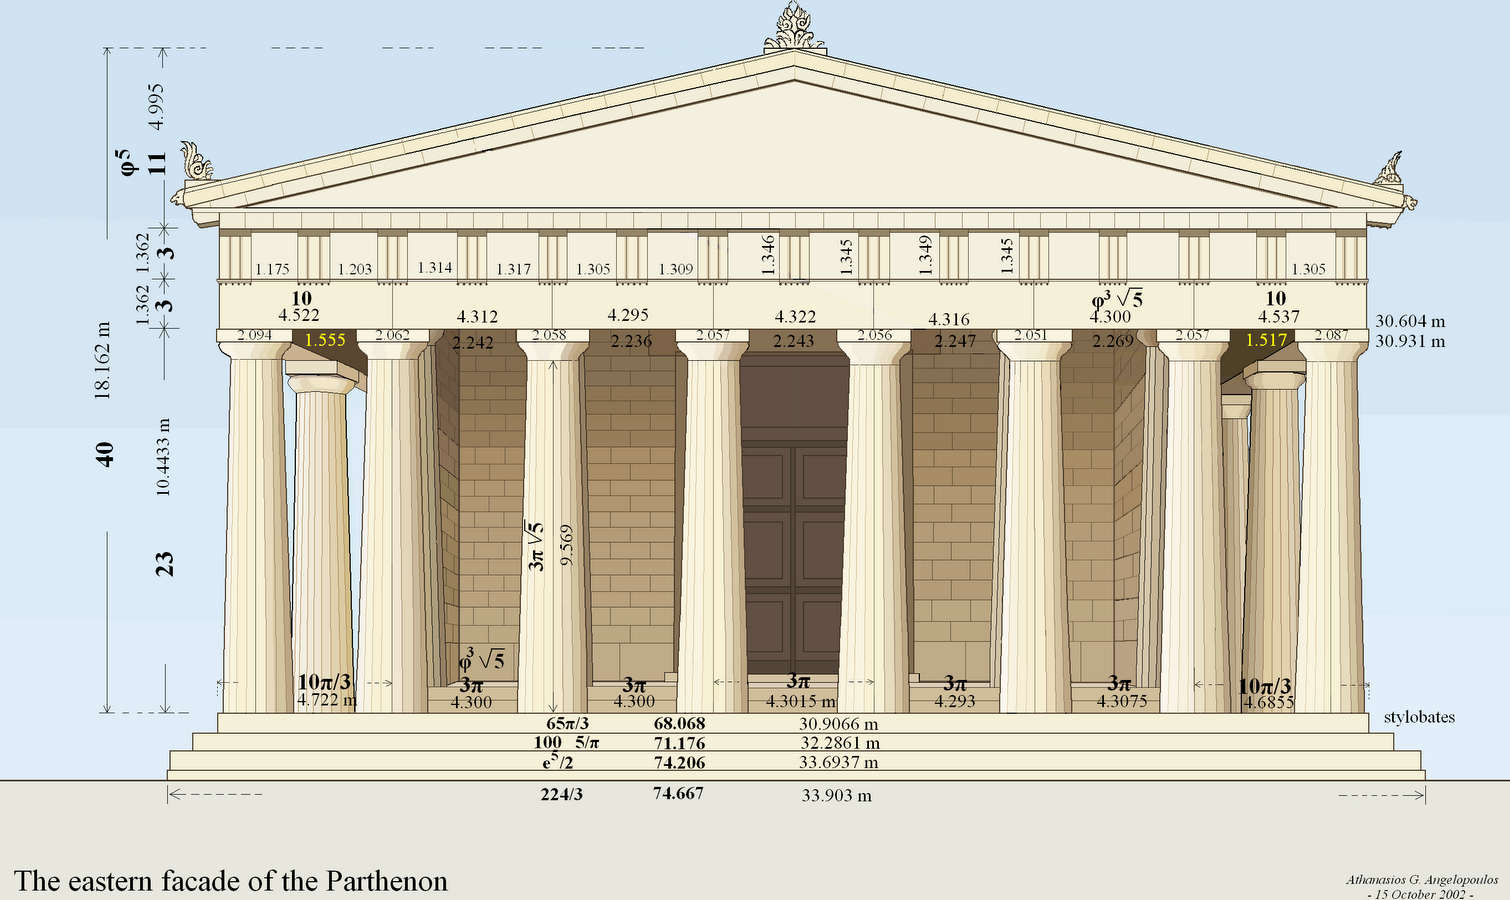 greek architecture diagram 2003 saturn ion engine chris impens valvas debunking golden ratio 2